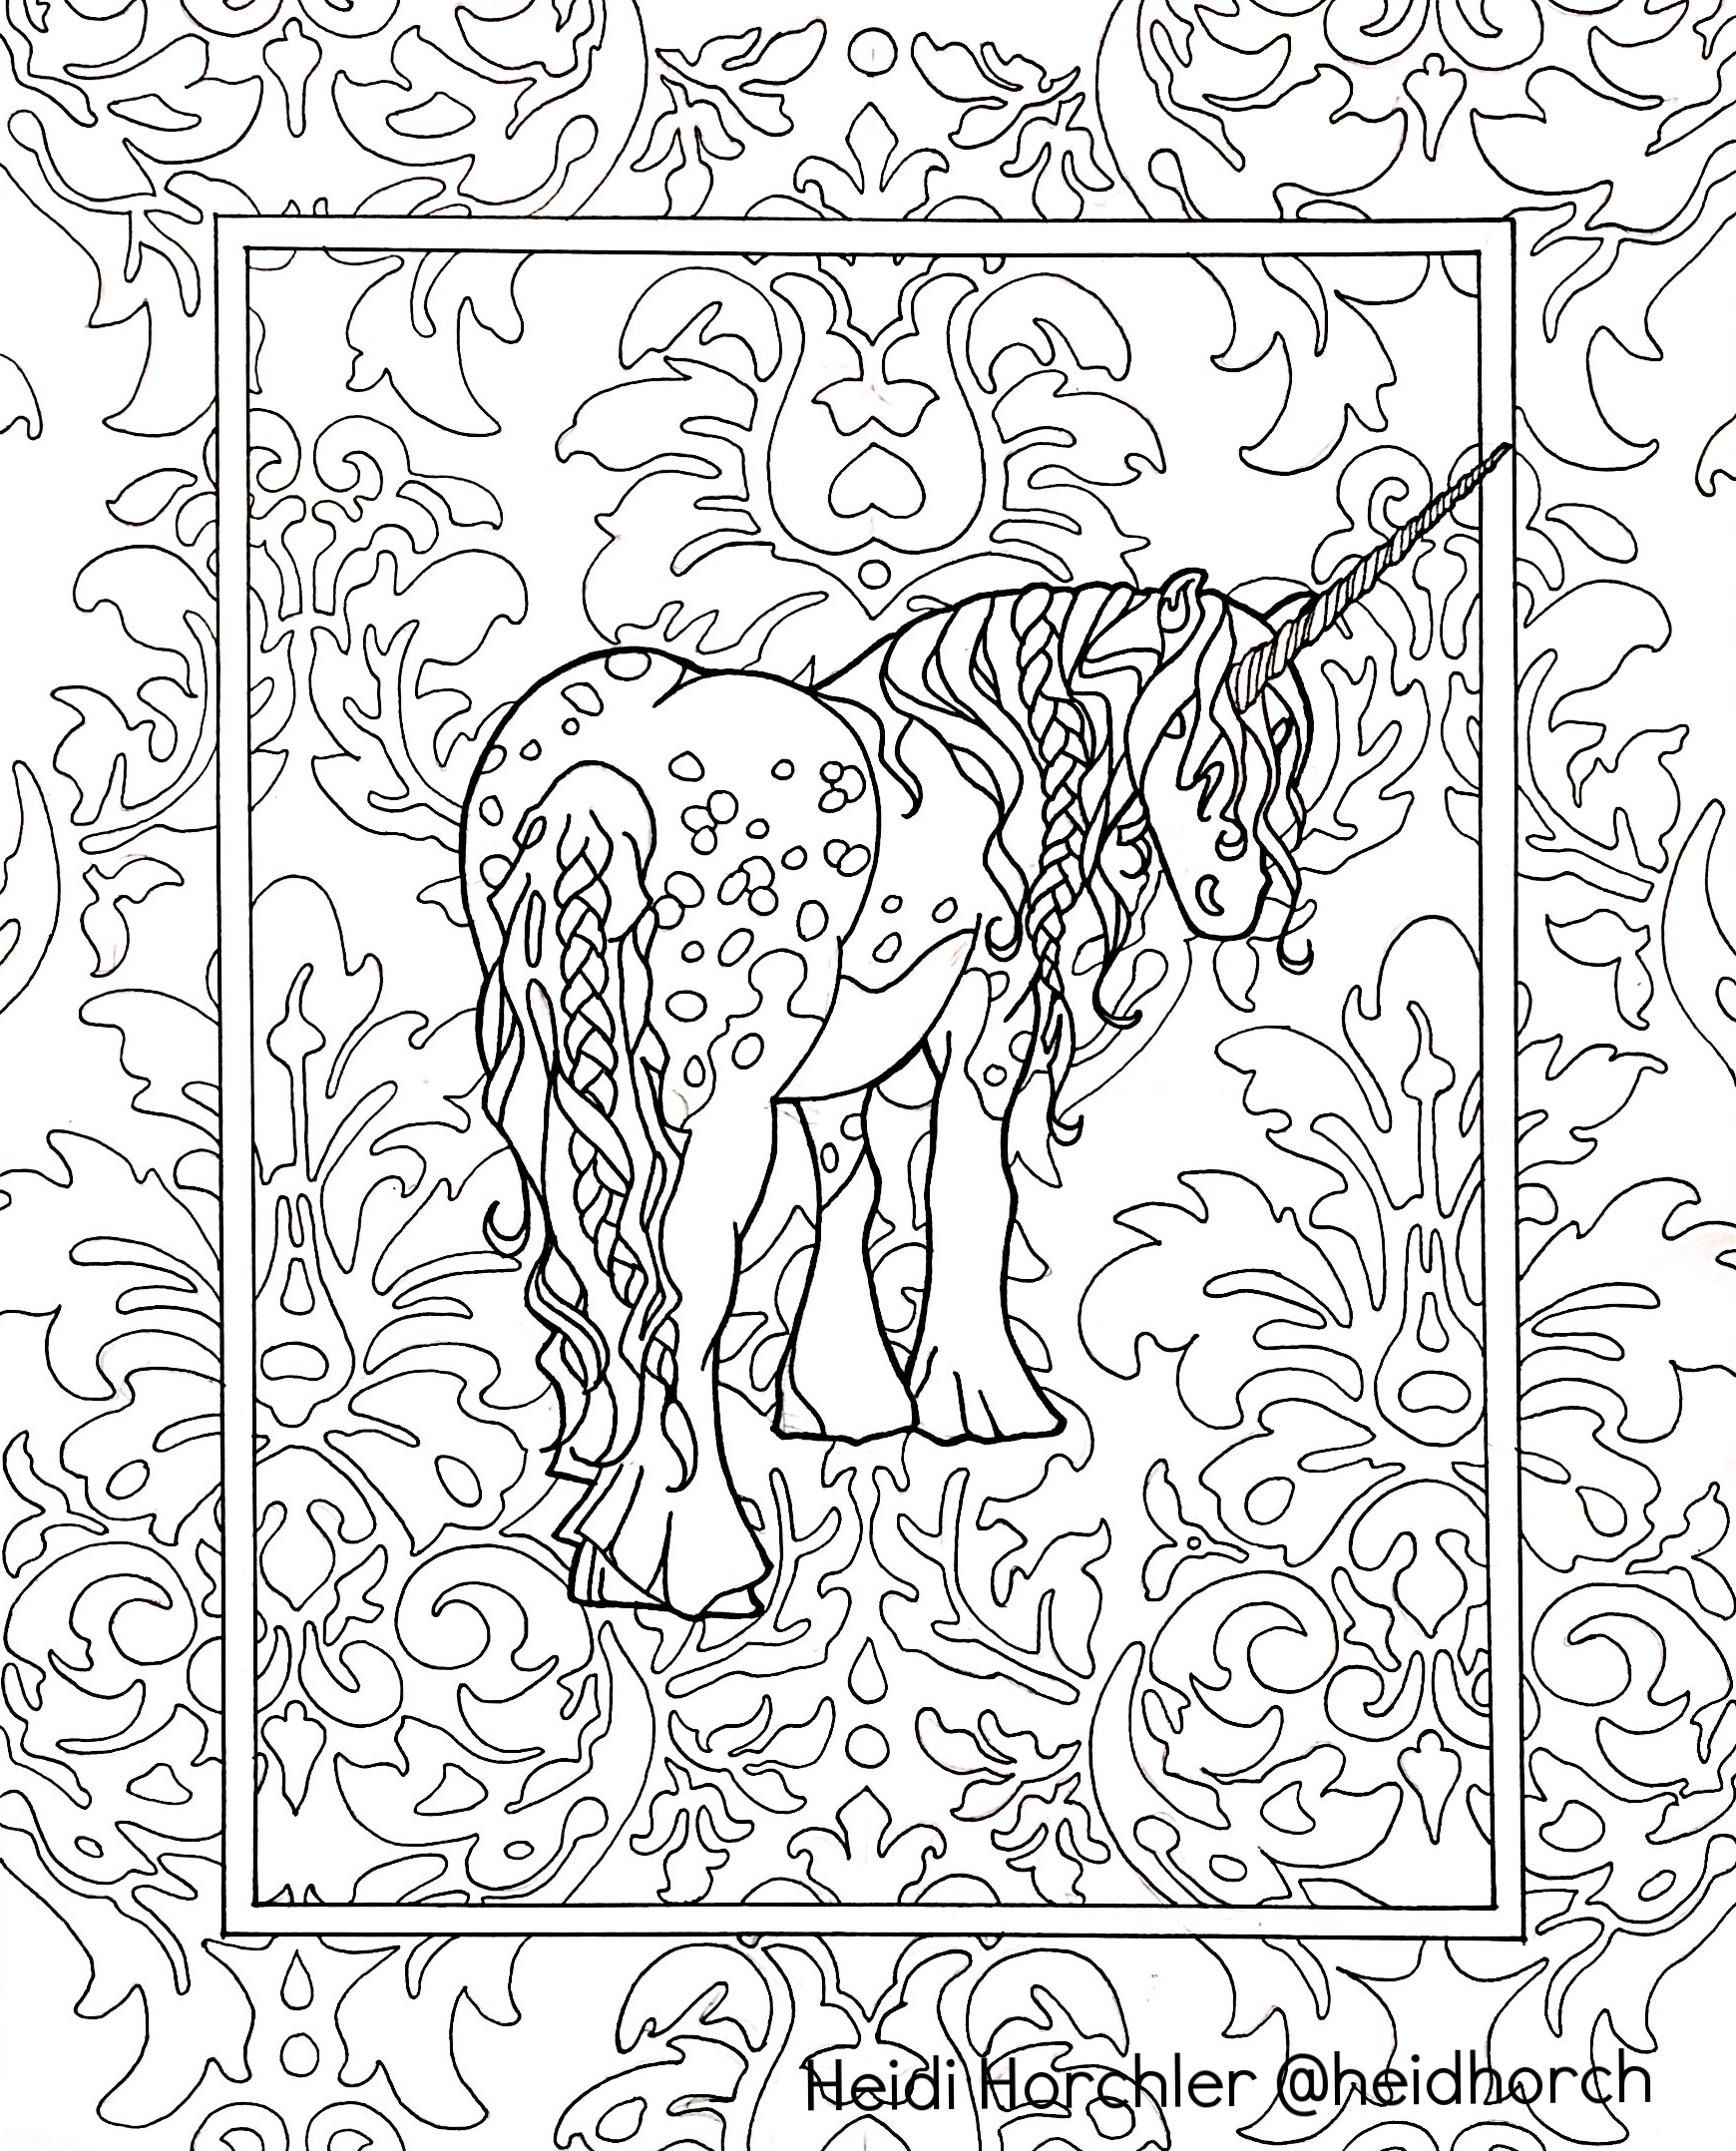 Unicorn - Daydream Odyssey coloring book